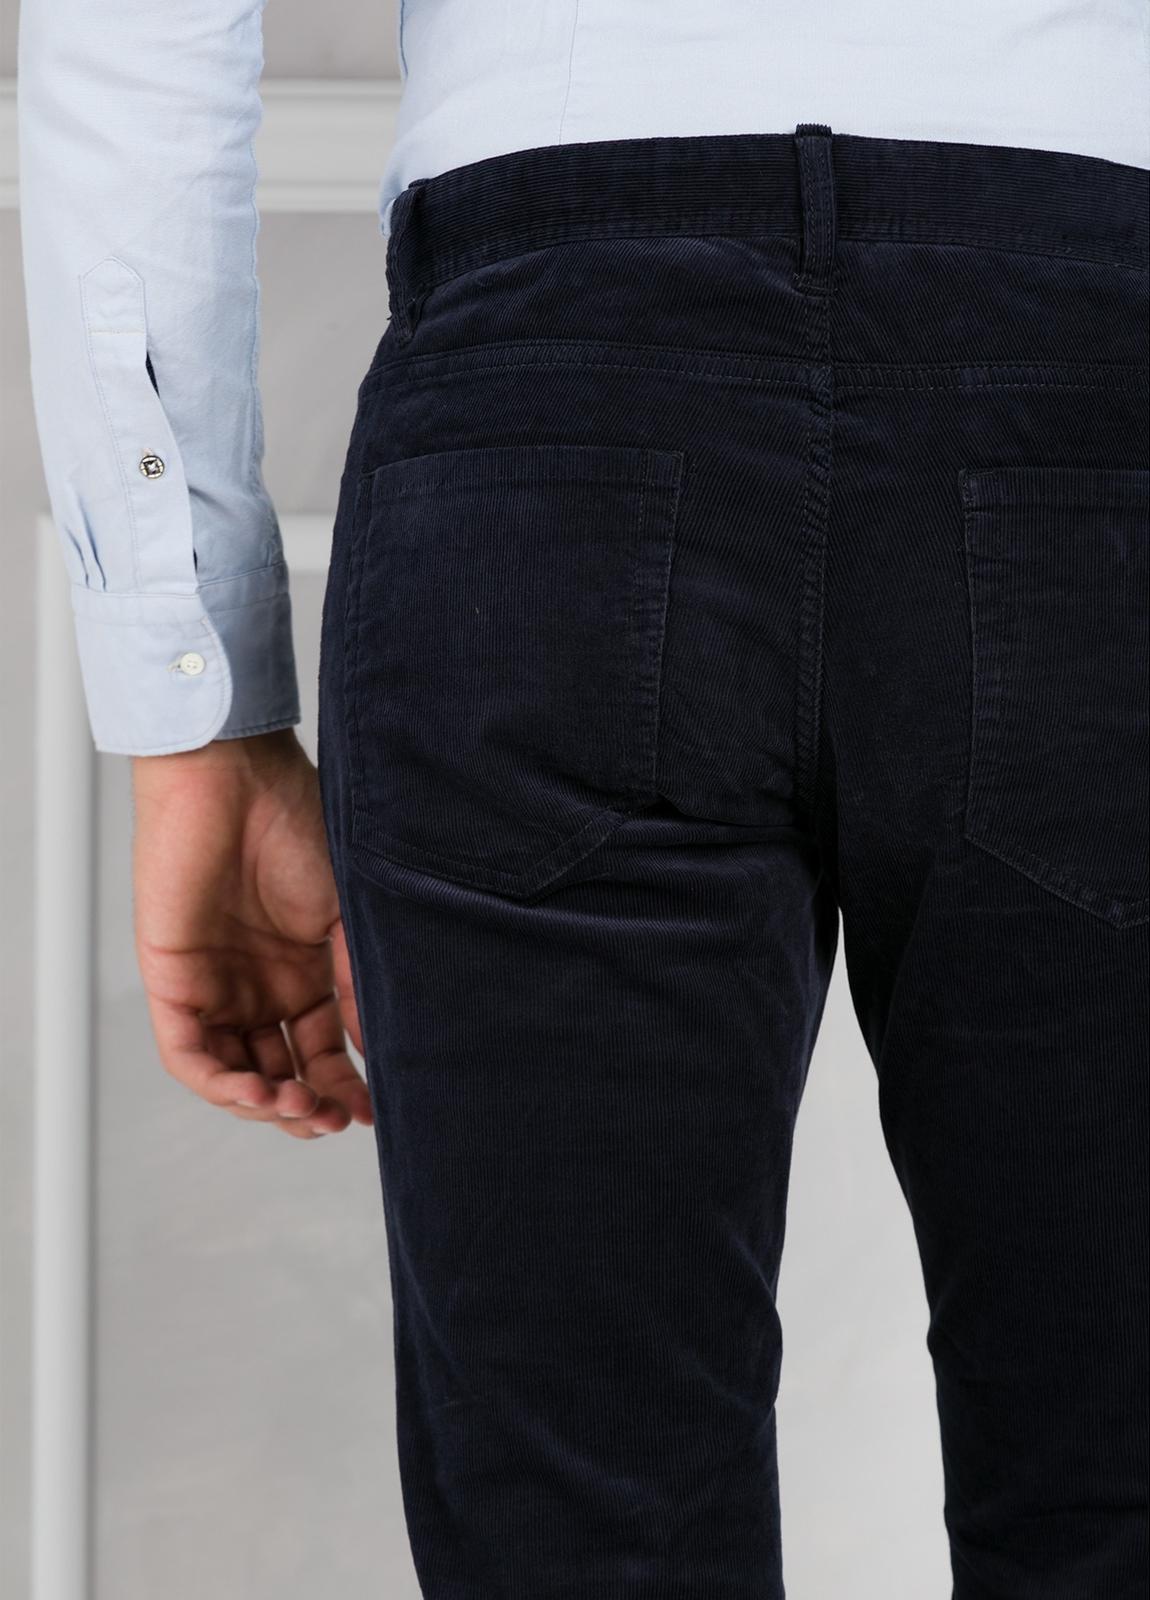 Pantalón 5 bolsillos micropana modelo FRED color azul marino. 98% Algodón 2% Elastano. - Ítem3